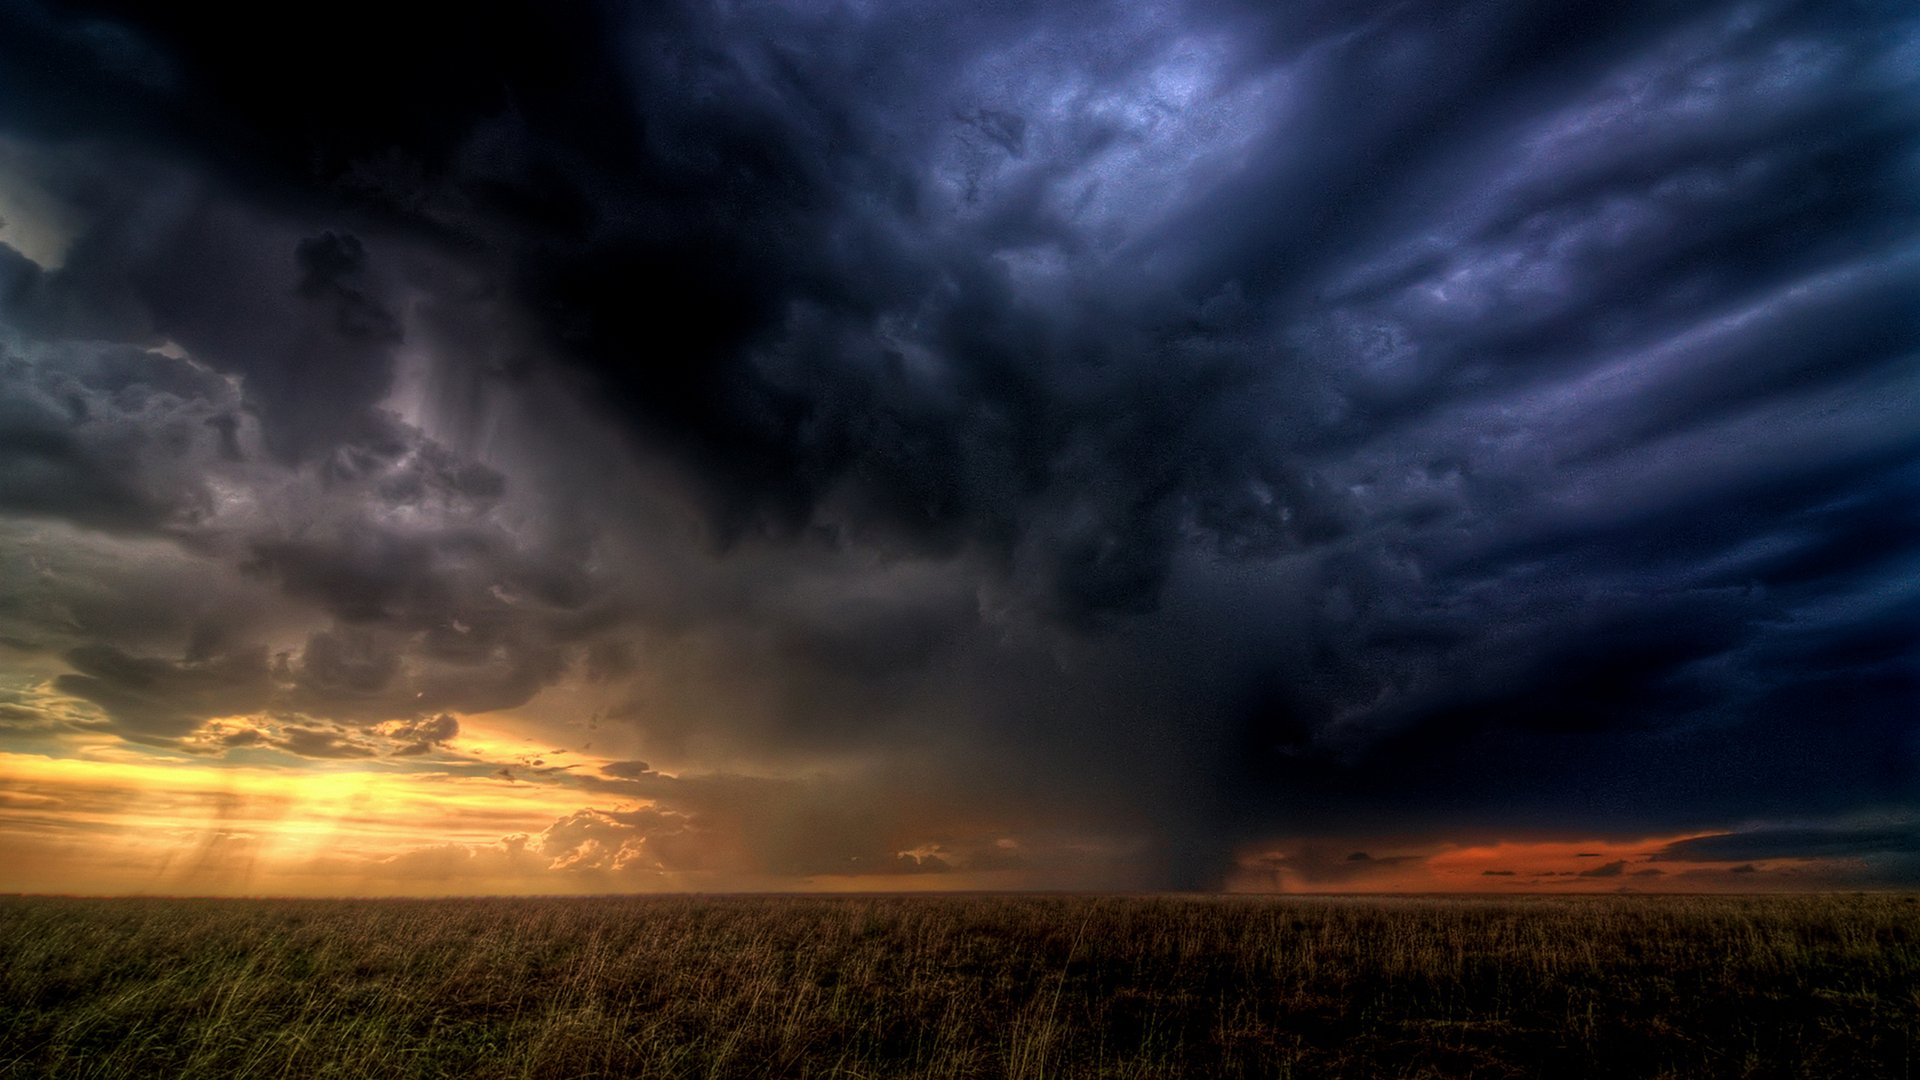 Storm Clouds Wallpaper